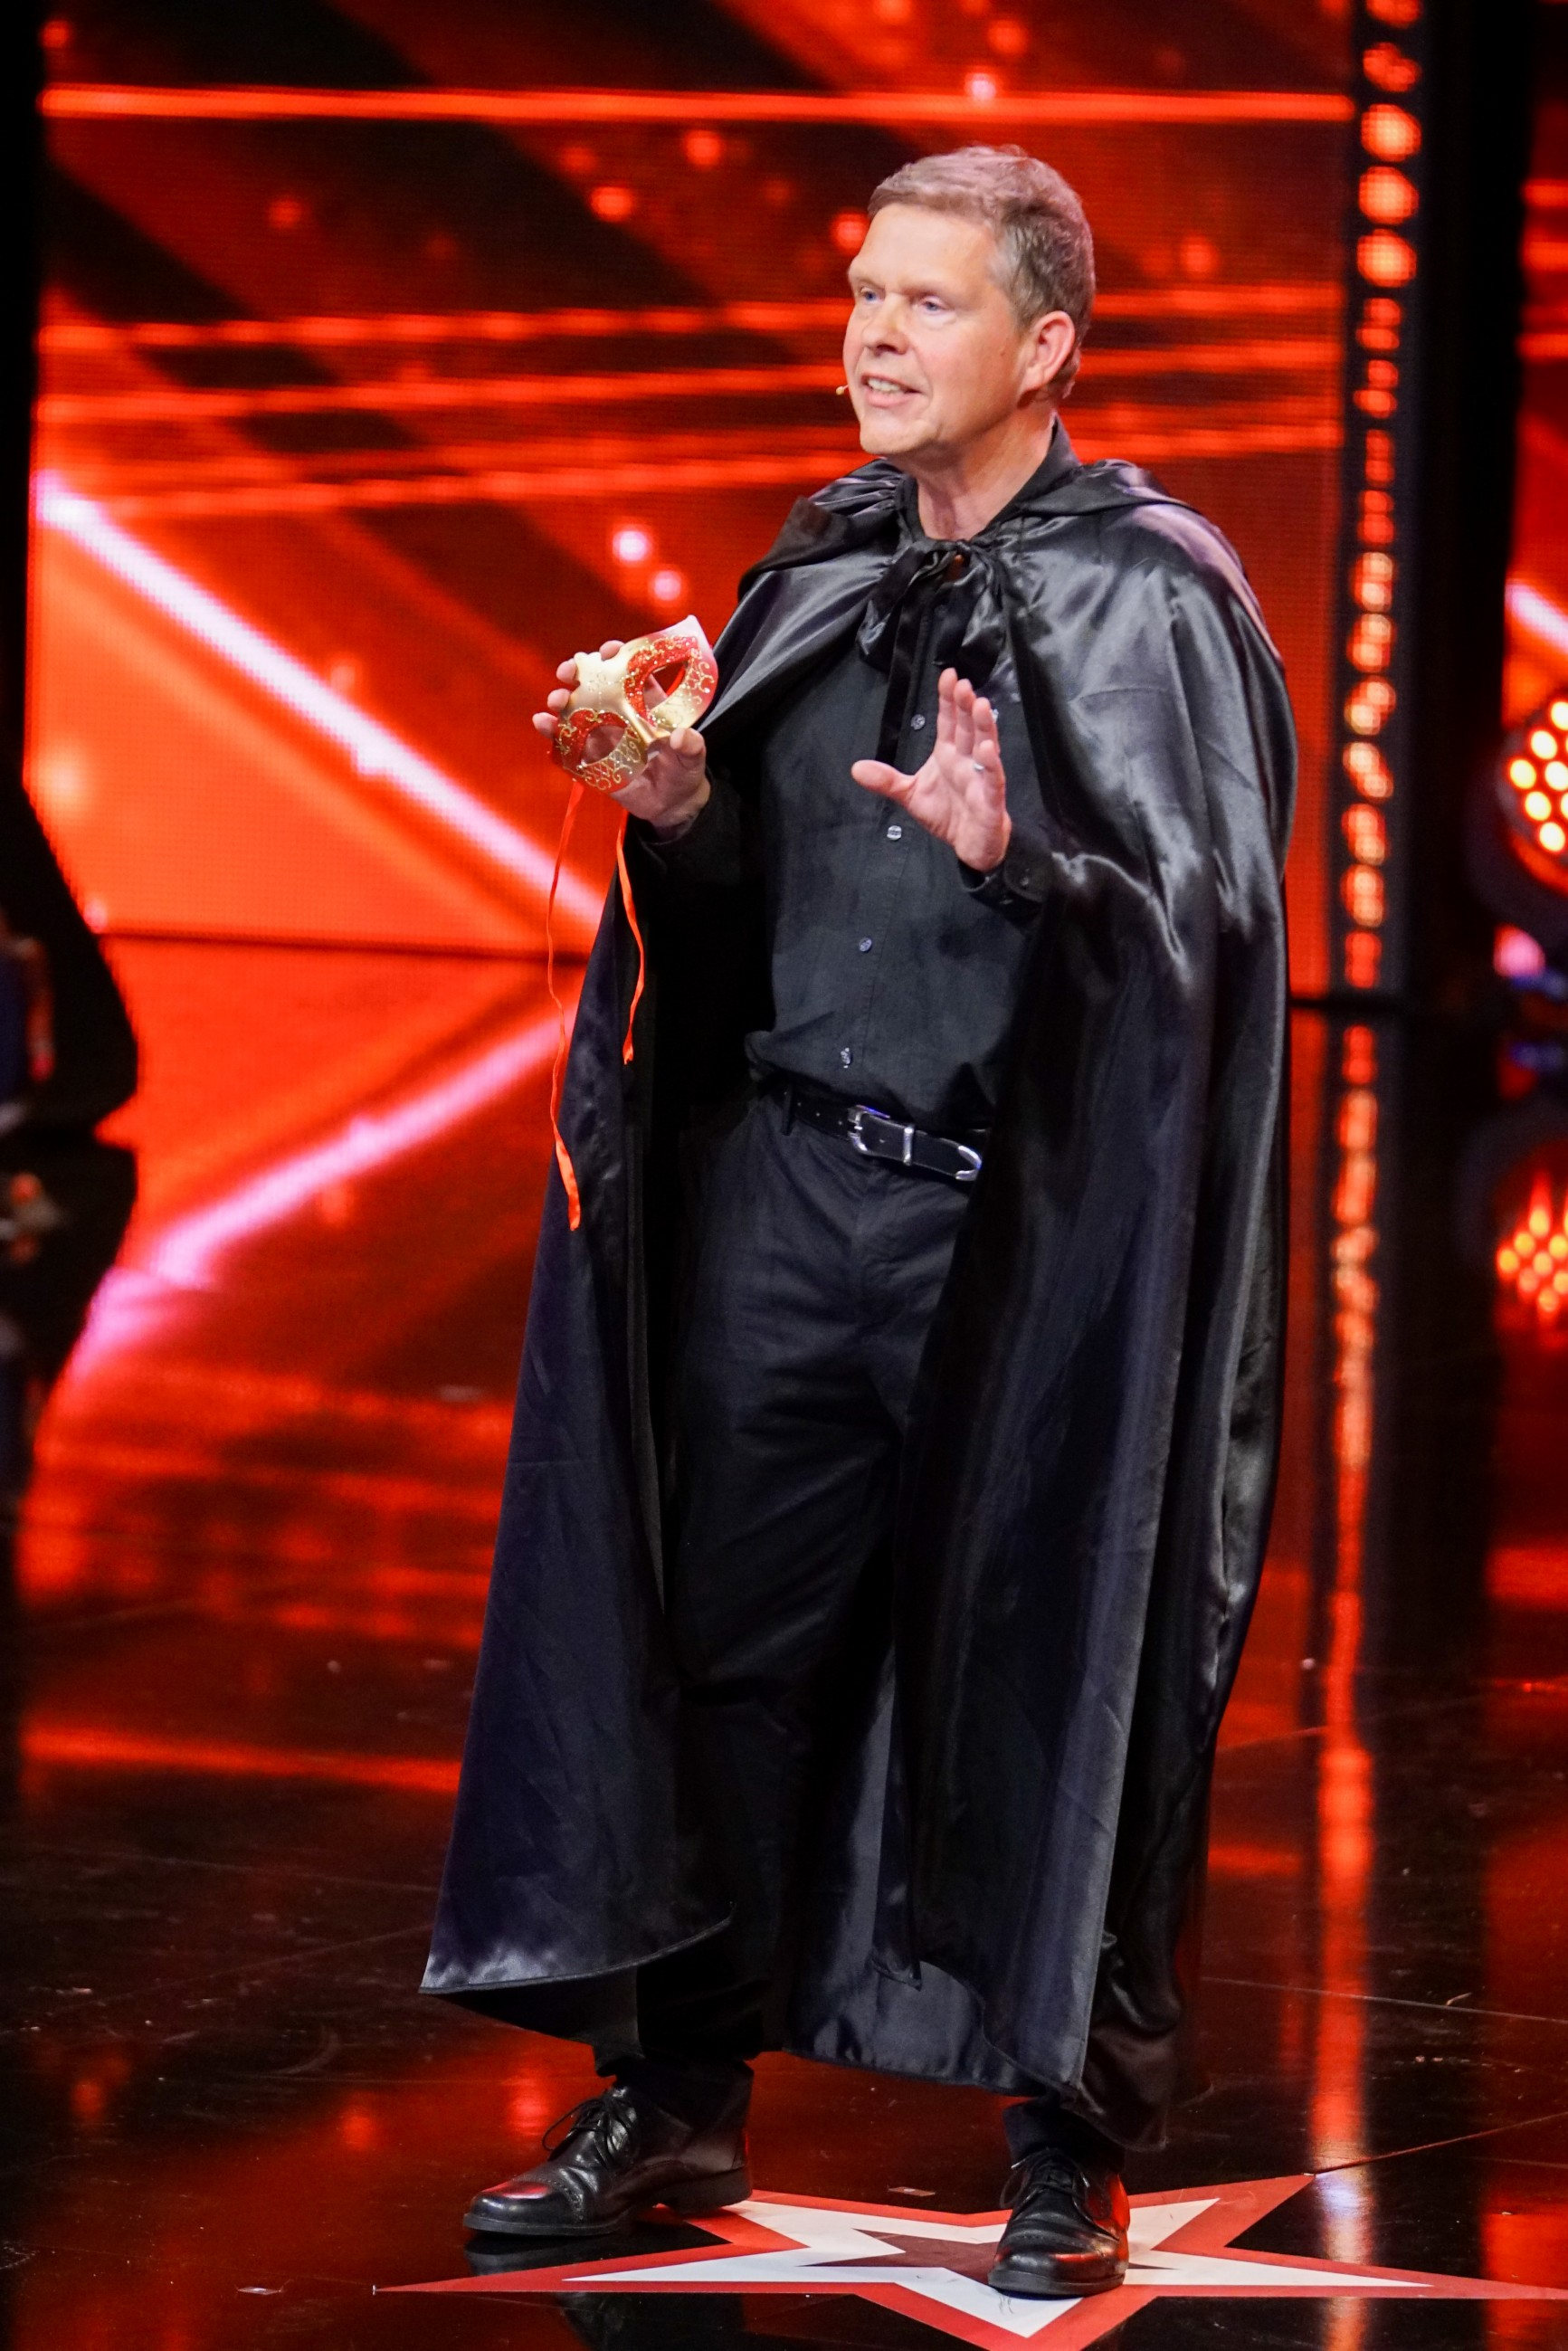 Das Supertalent 2017 Show 8 - Jürgen Kemper